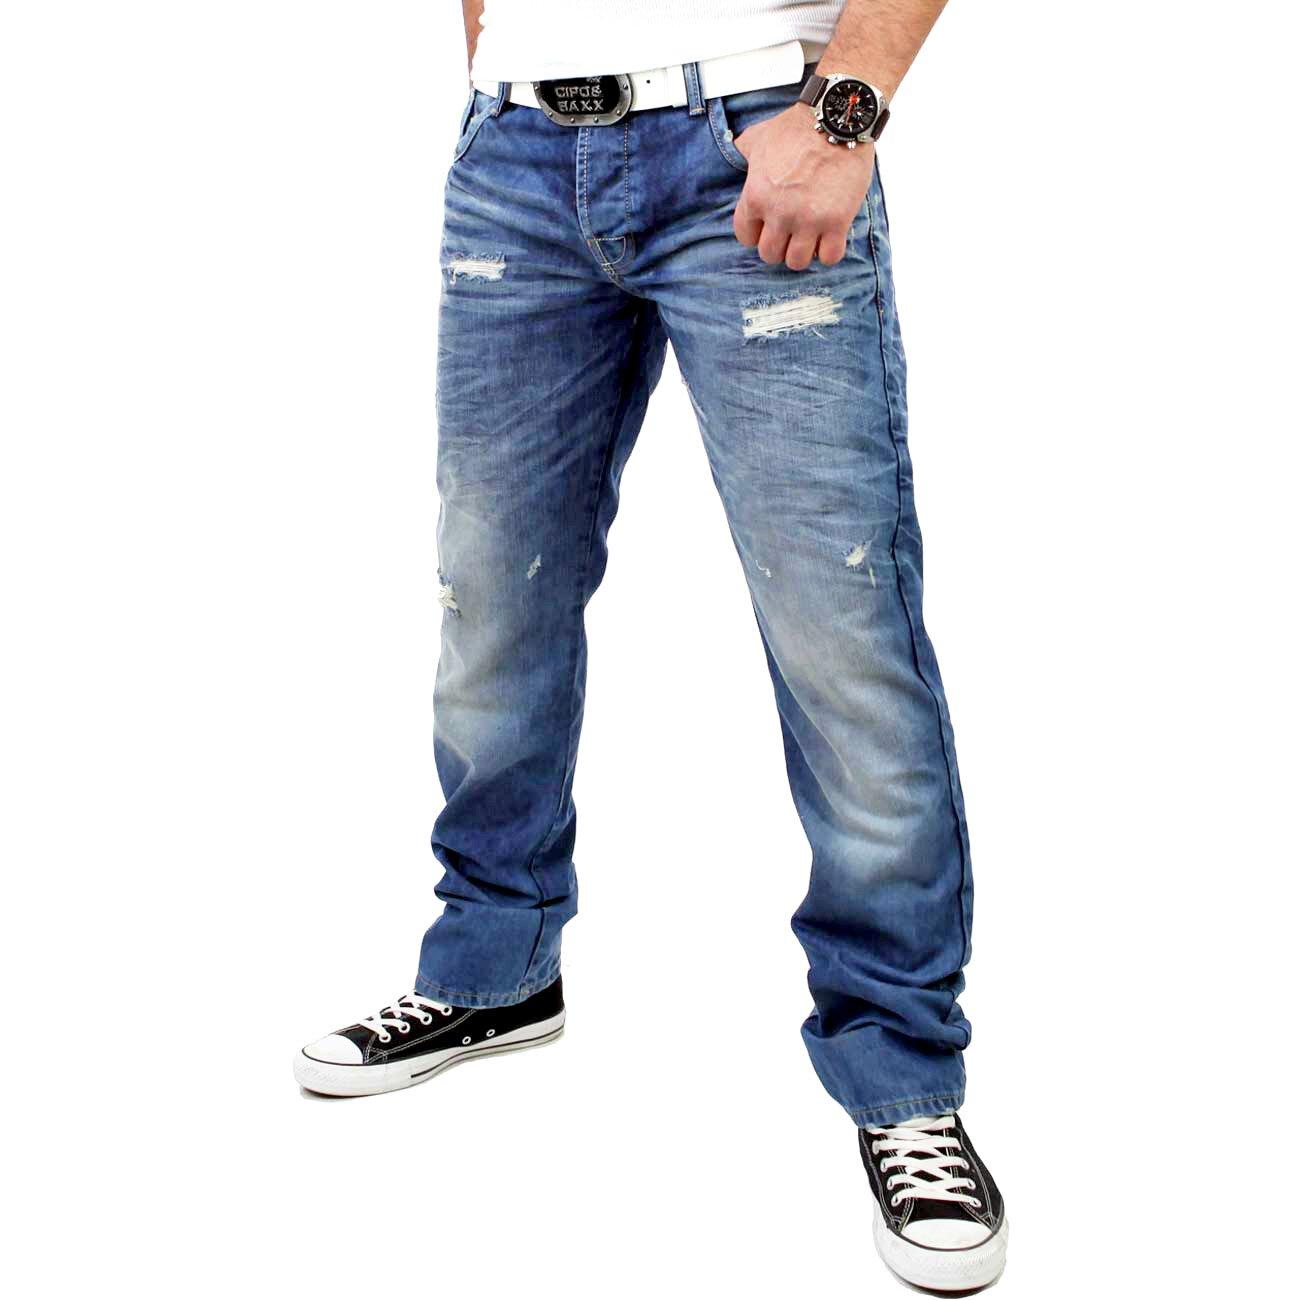 cipo baxx jeans herren destroyed look c 1010 kaufen. Black Bedroom Furniture Sets. Home Design Ideas